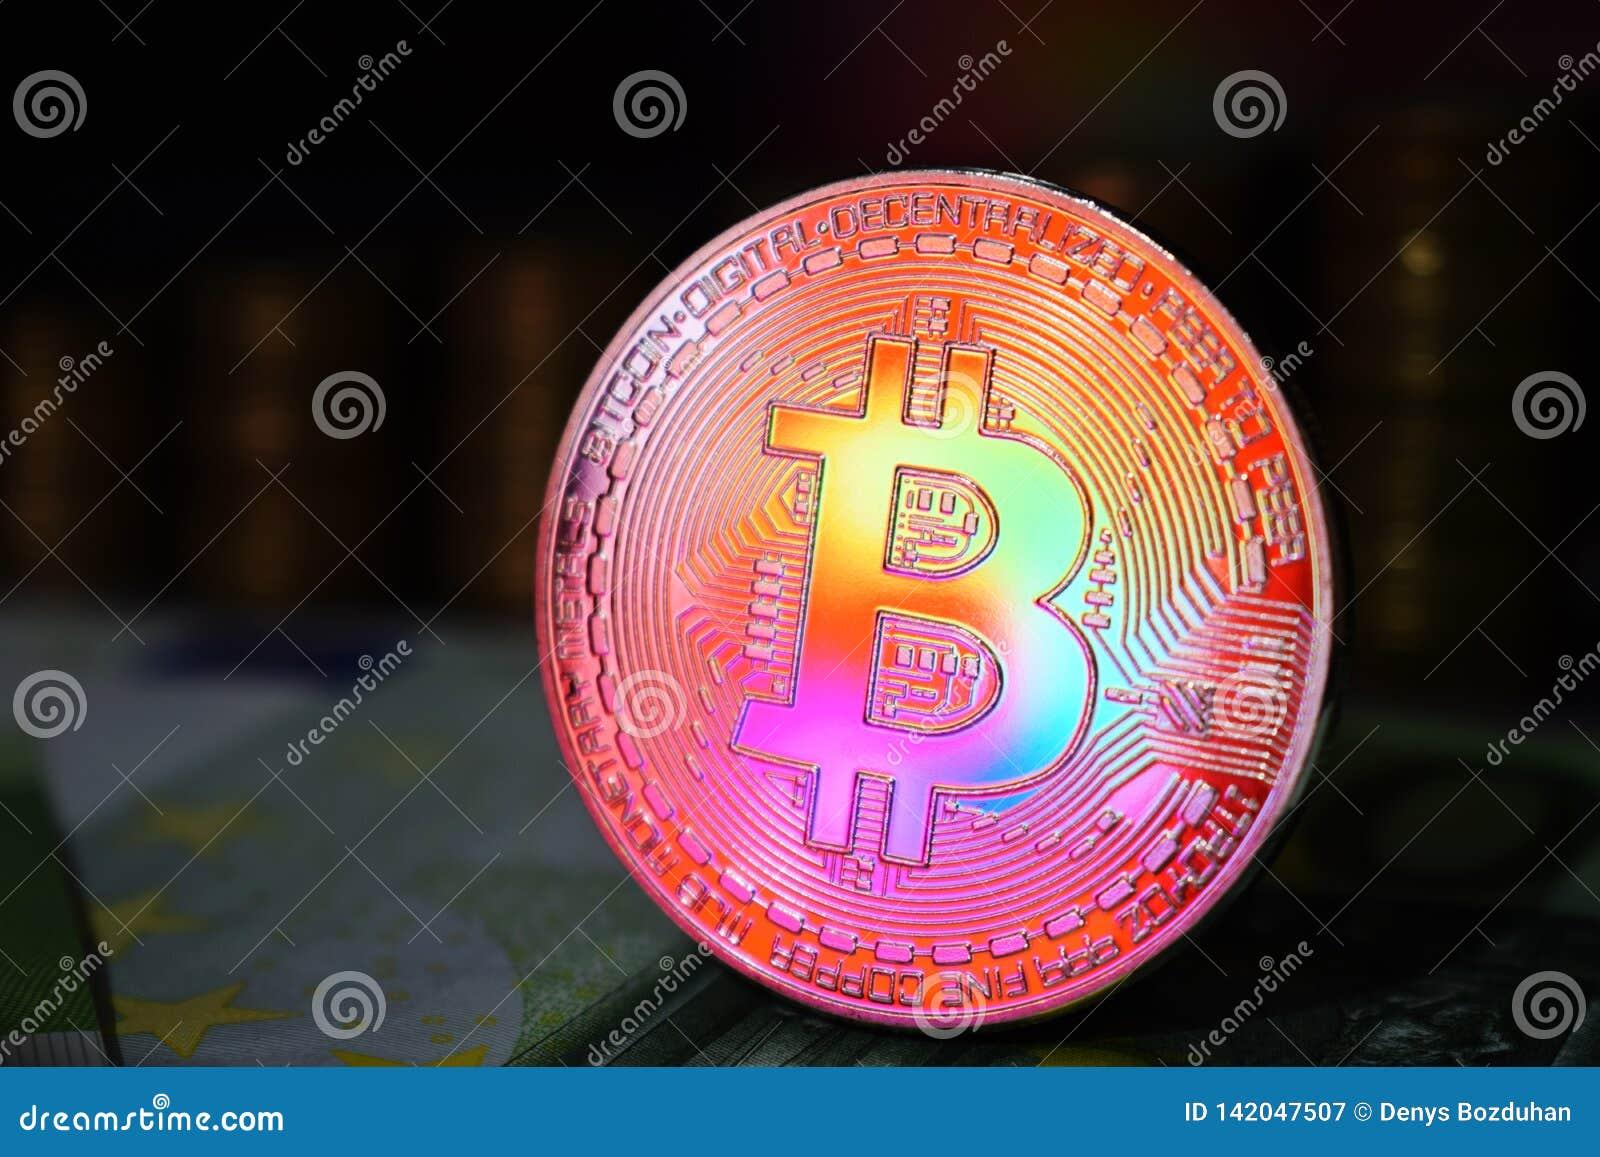 the concept of bitcoin